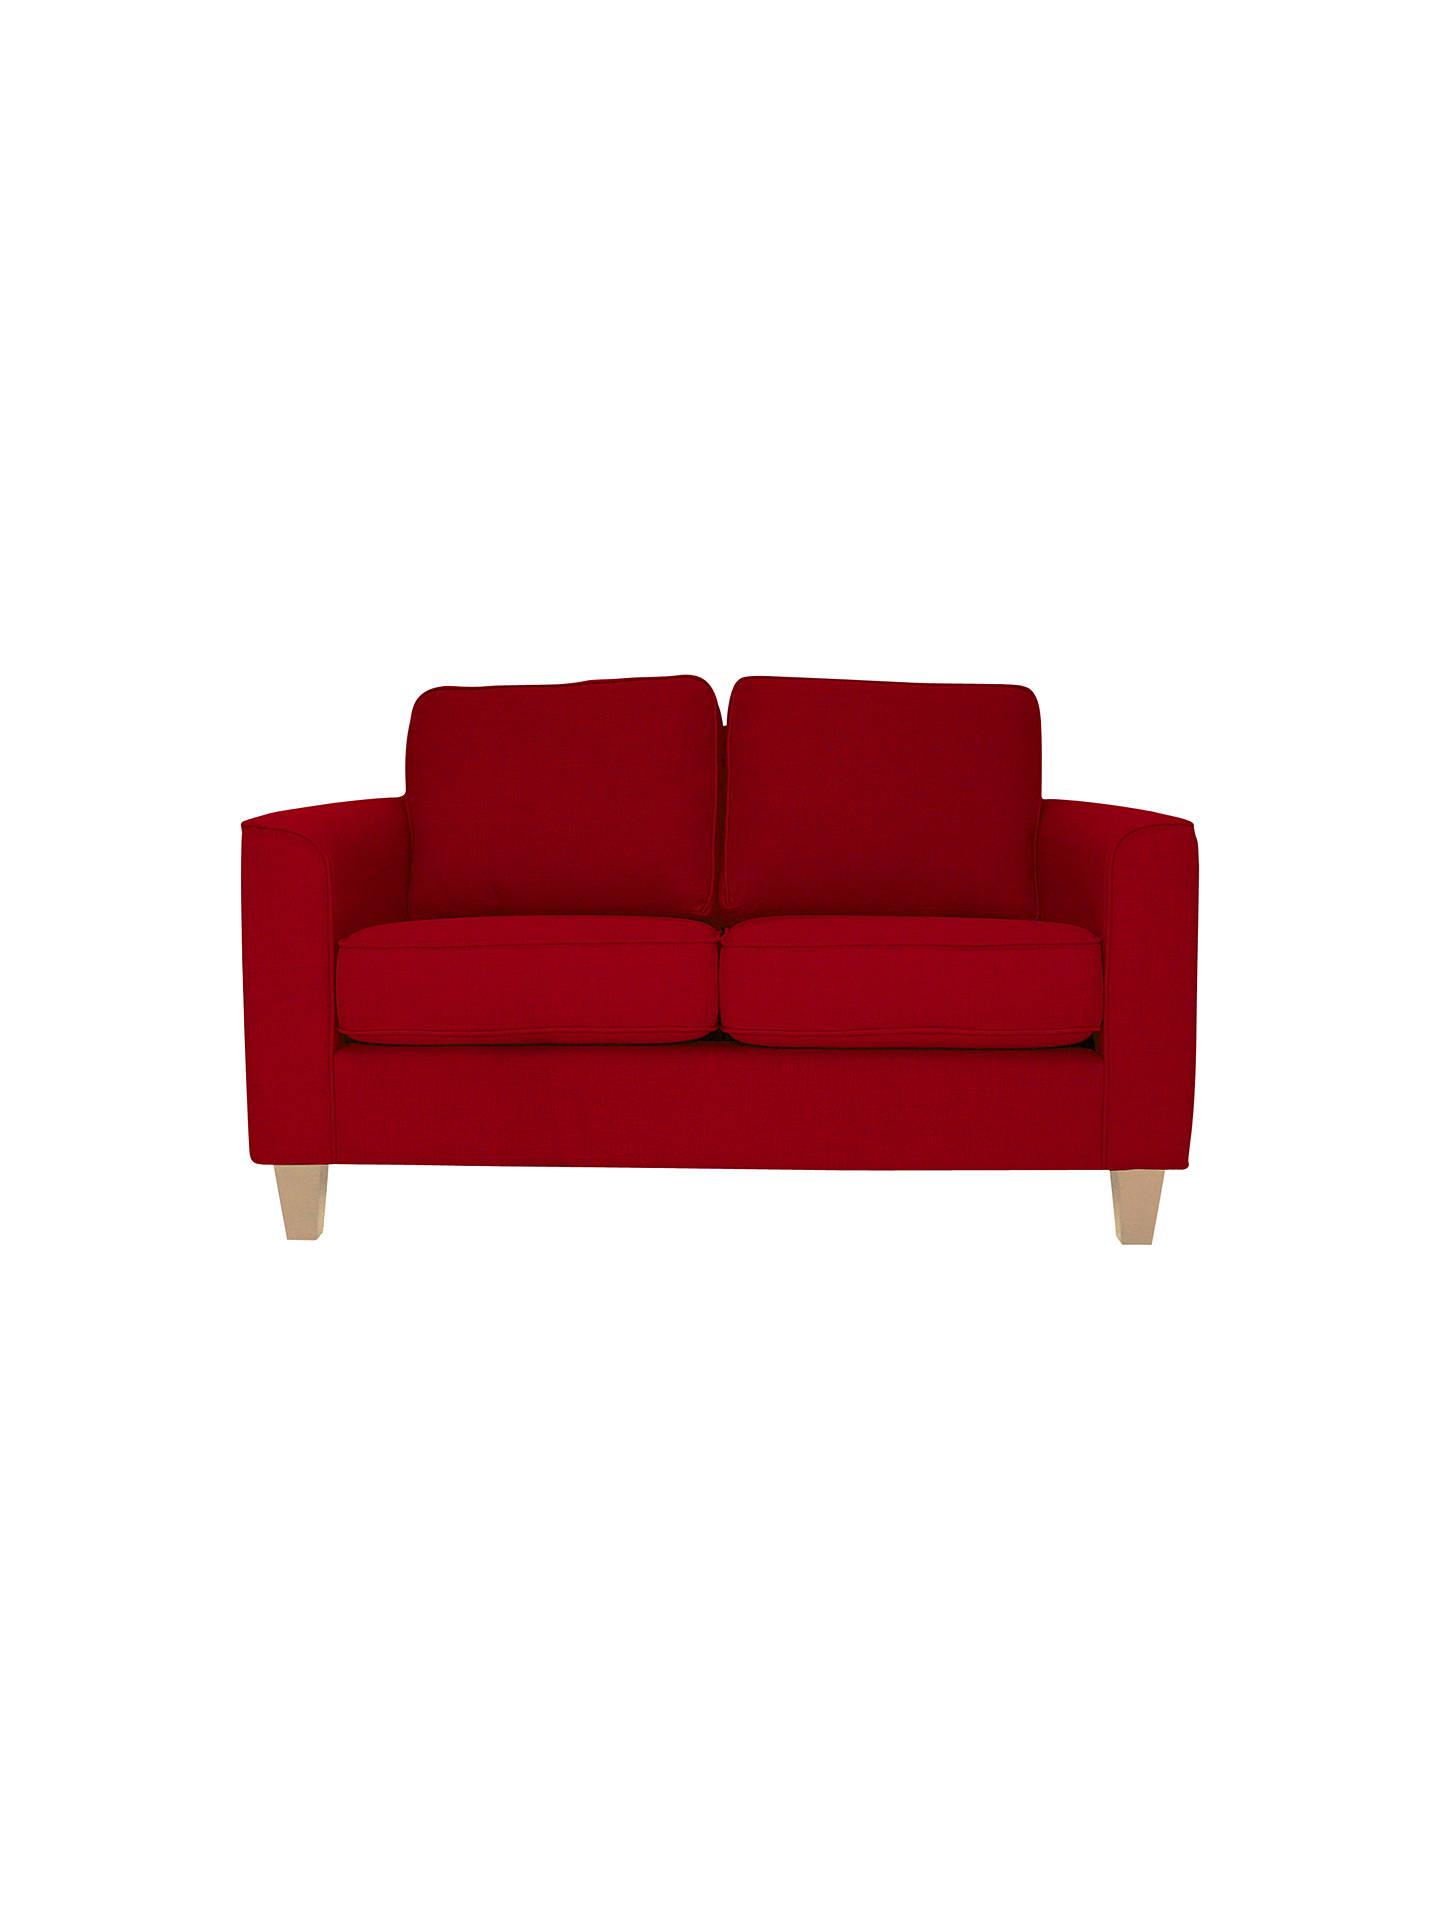 John Lewis Portia Small Sofa With Light Legs At John Lewis